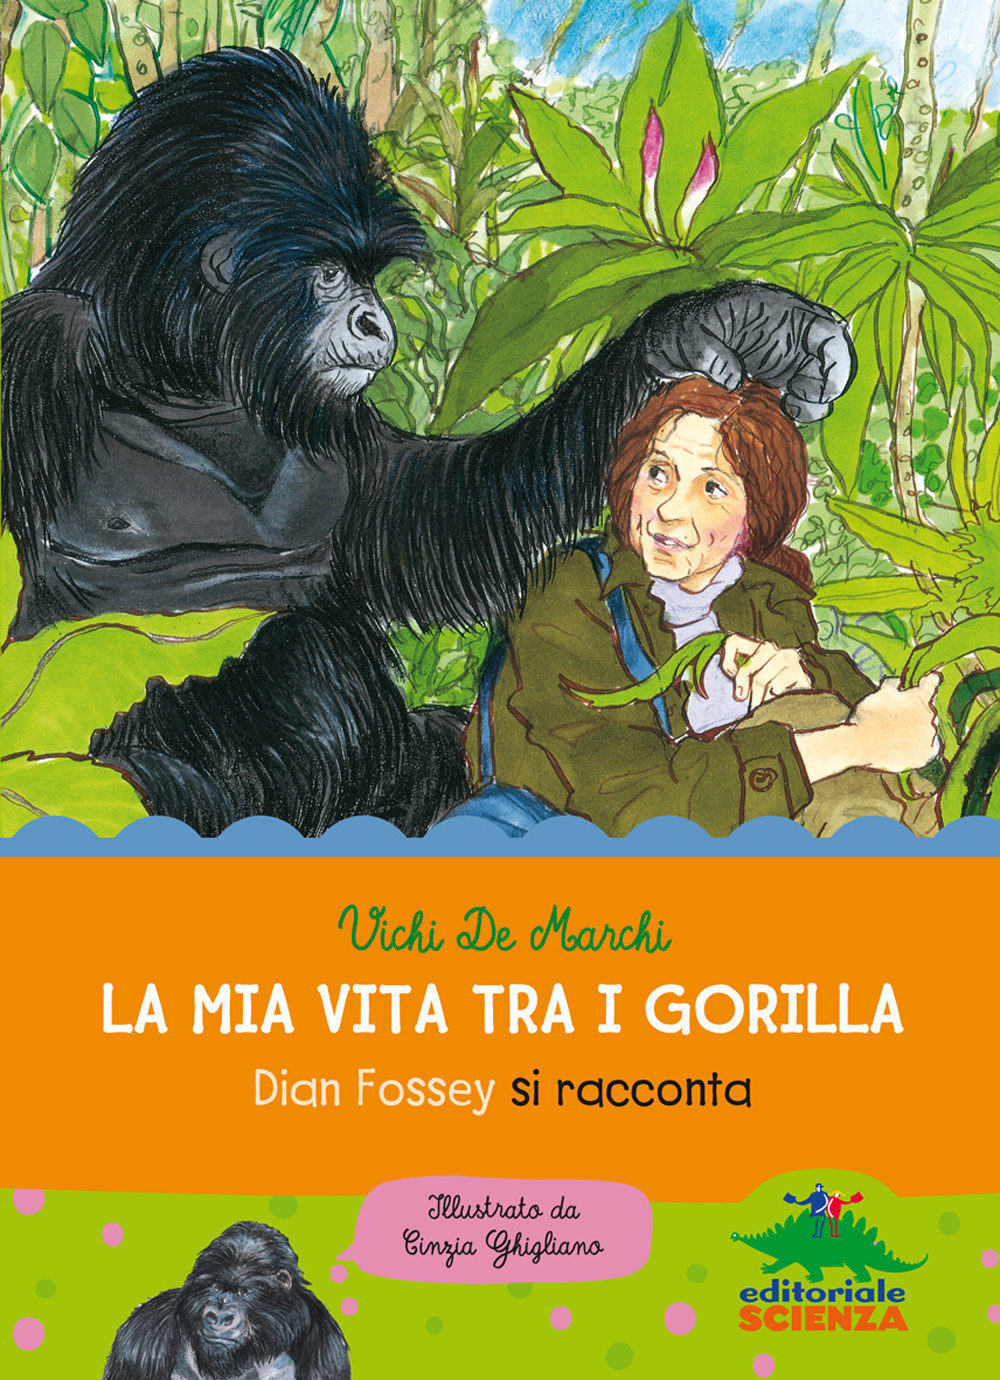 La mia vita tra i gorilla. Dian Fossey si racconta. Ediz. illustrata